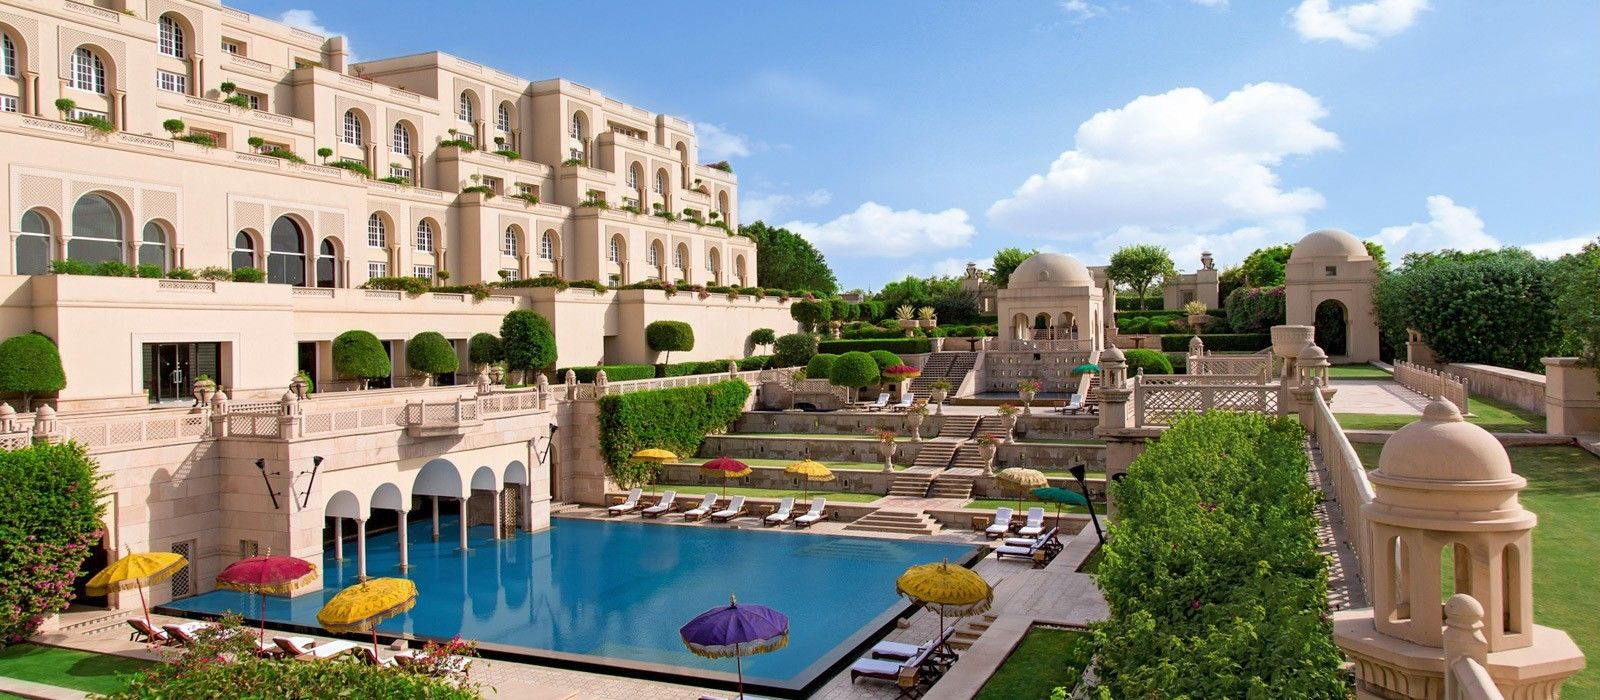 Oberoi Exklusiv: Royales Rajasthan und Safari Abenteuer Urlaub 6